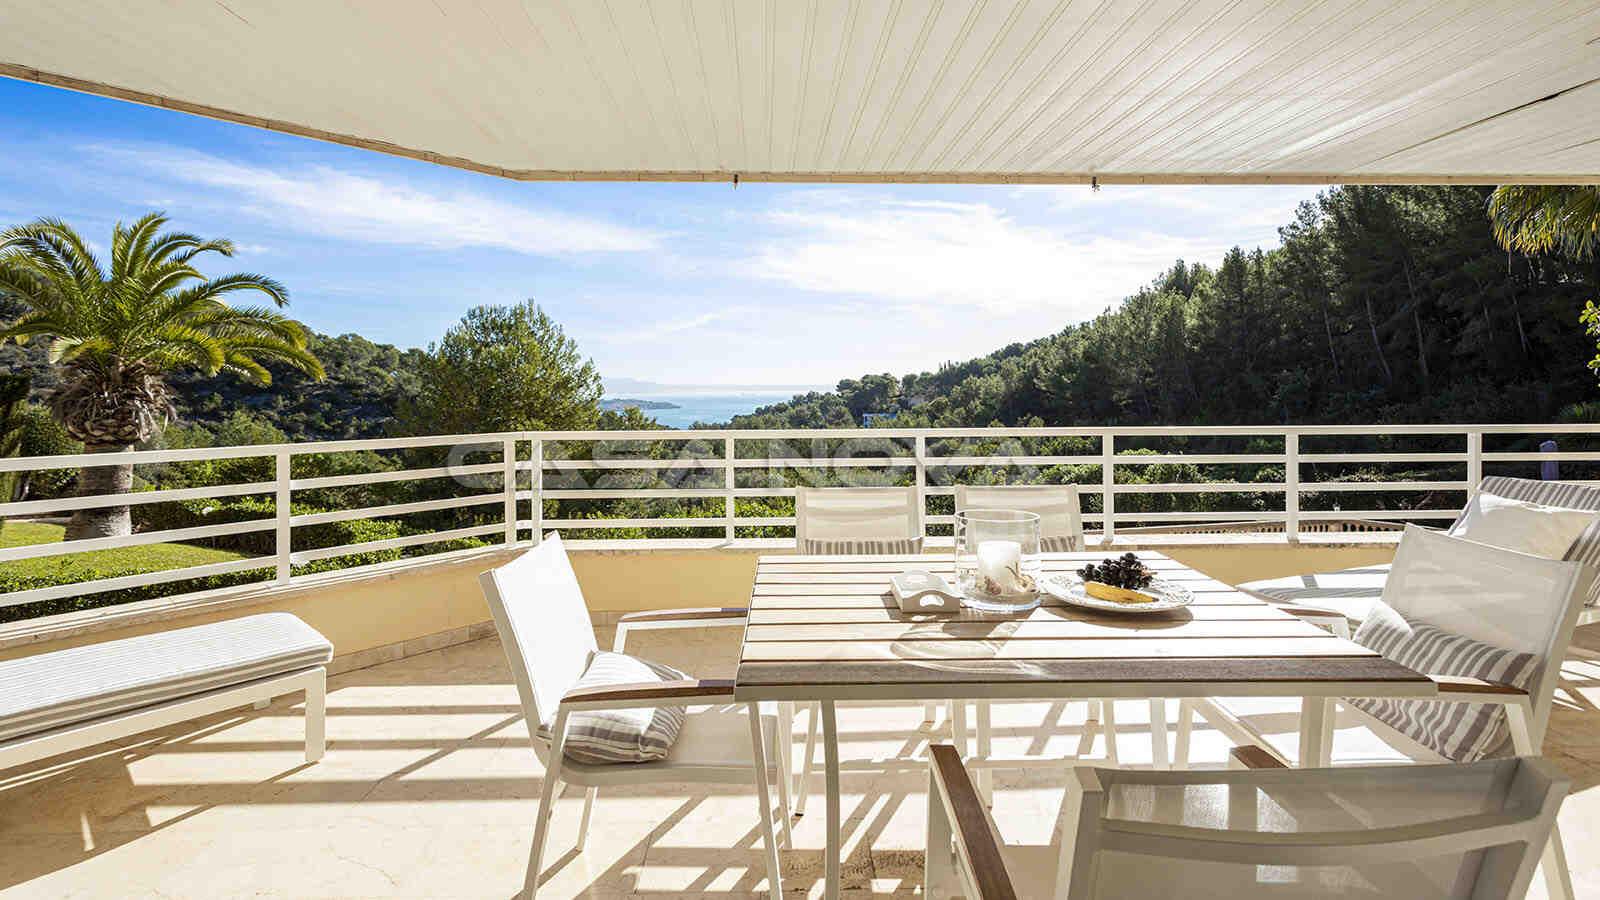 Schönes Mallorca Apartment mit Teil- Meerblick